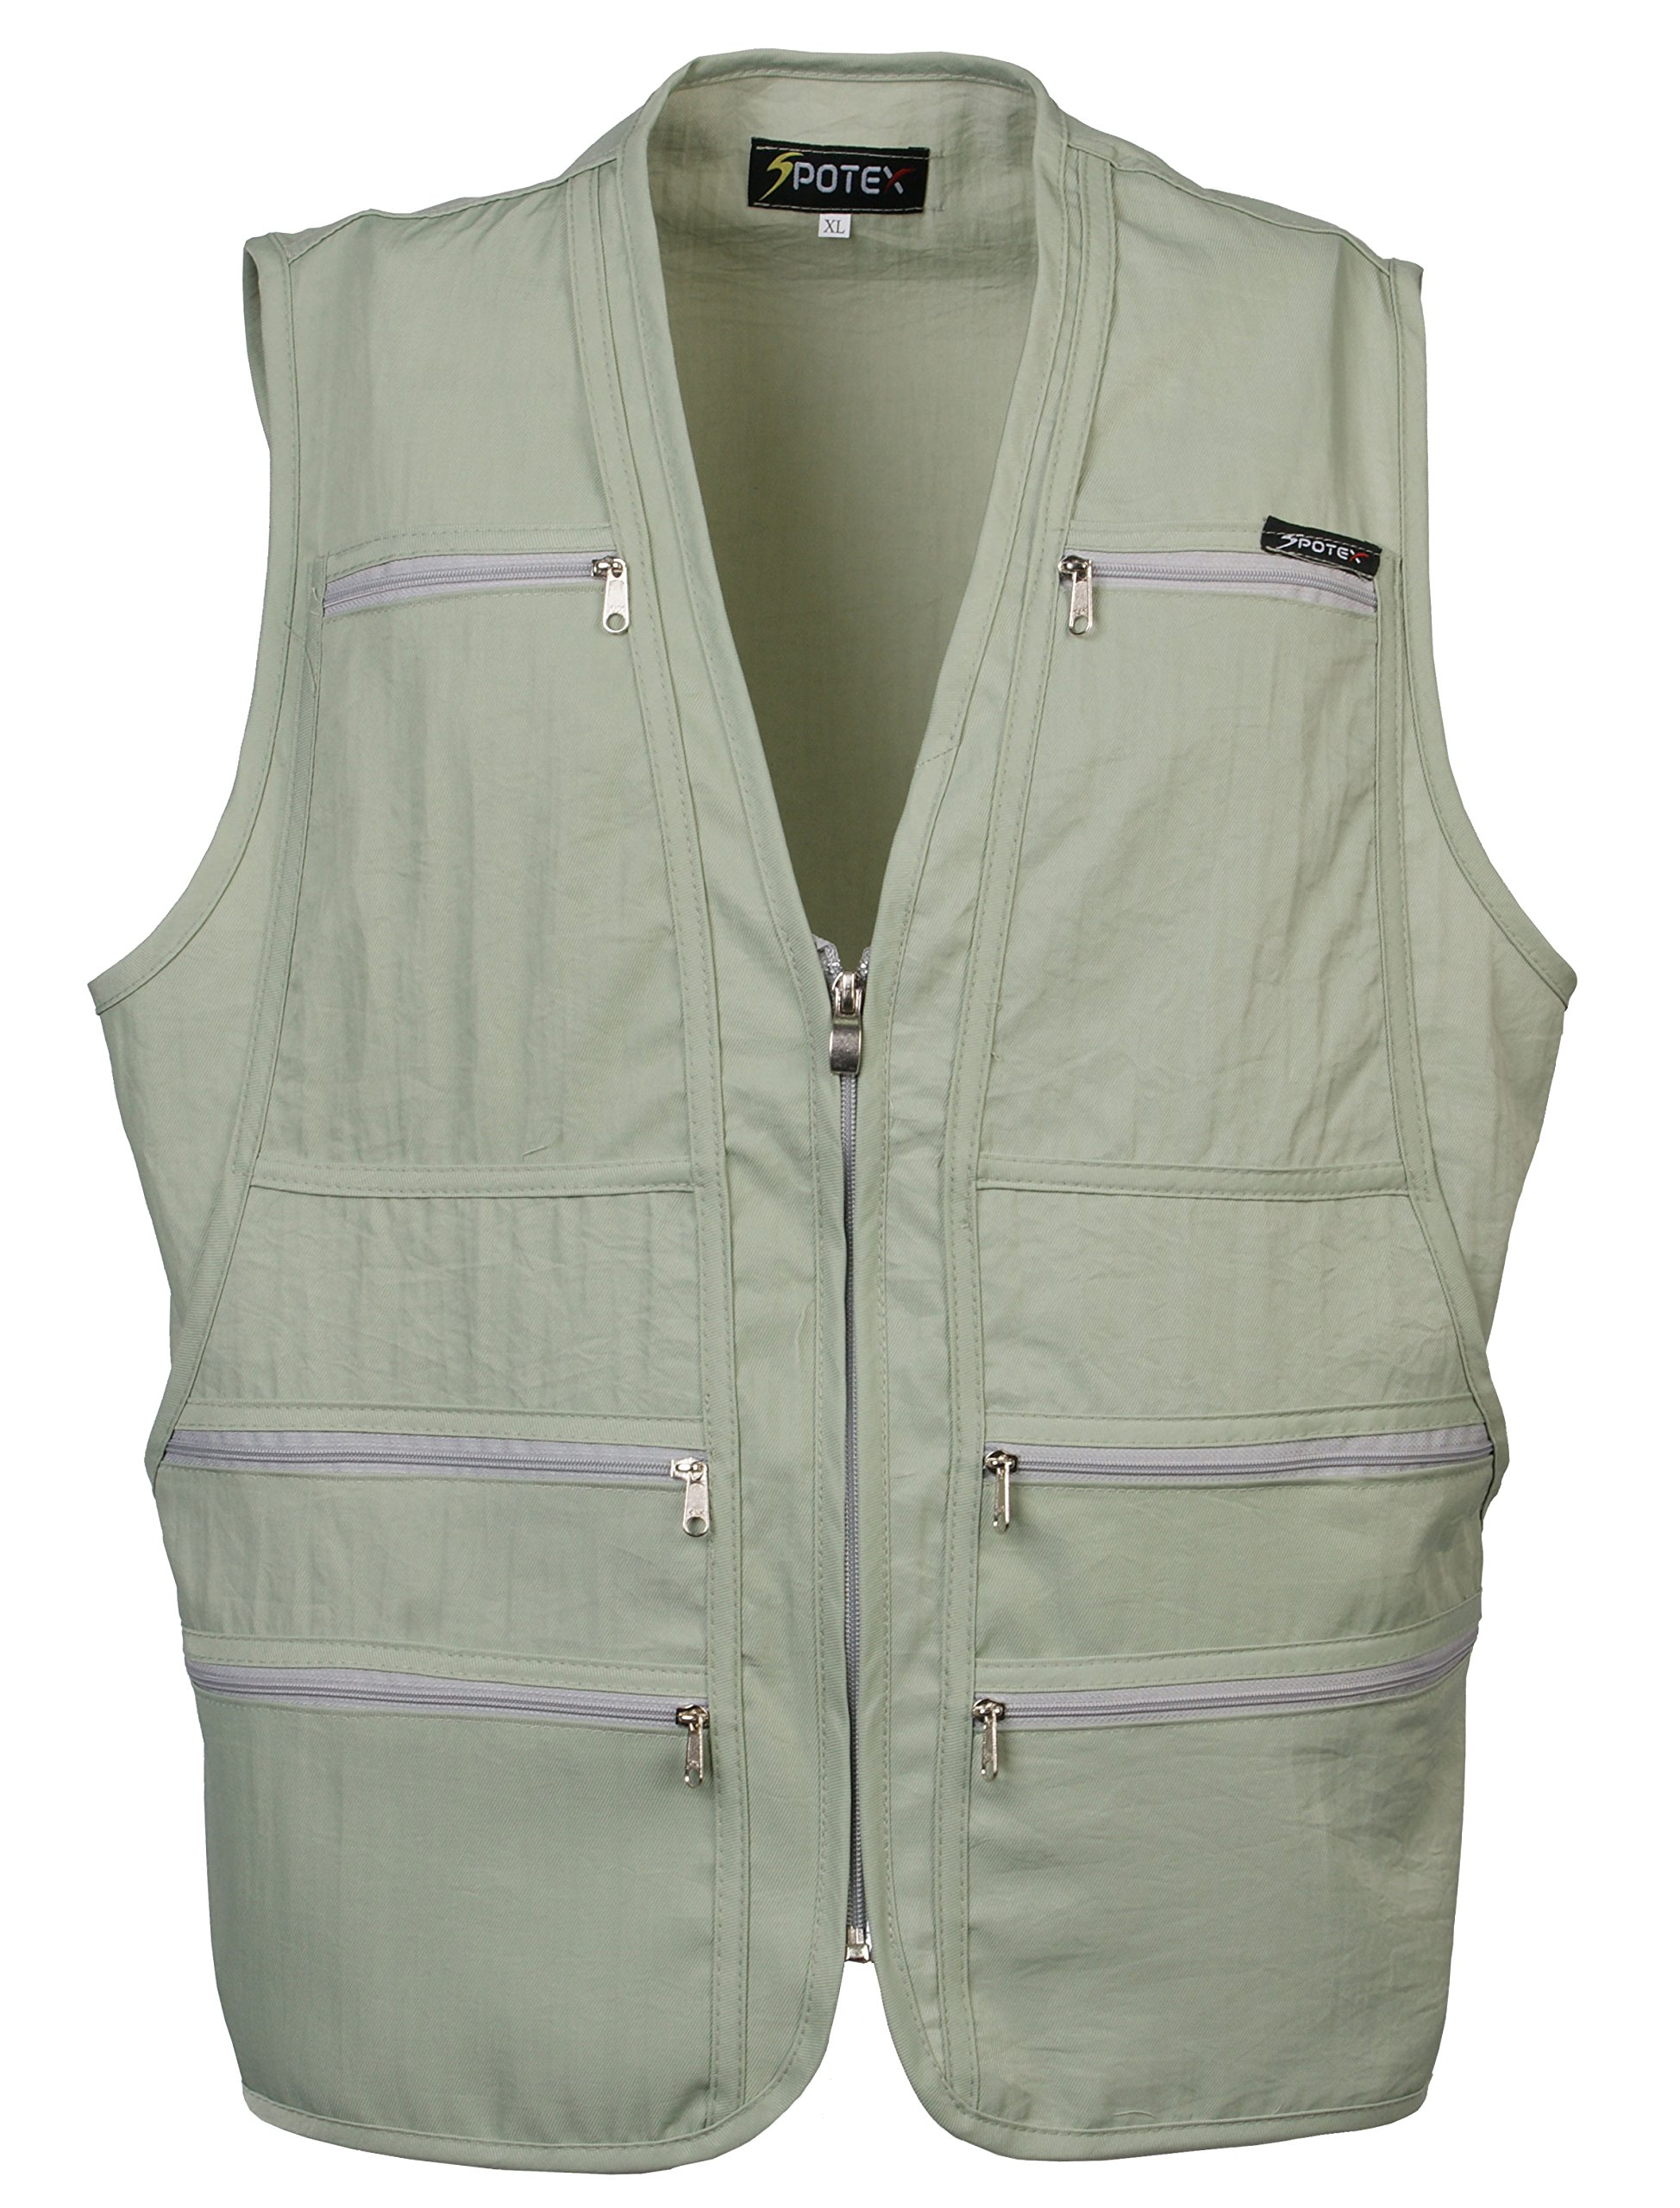 Men's 9 Pockets Work Utility Vest Military Photo Safari Travel Vest (L, Laurel Green)